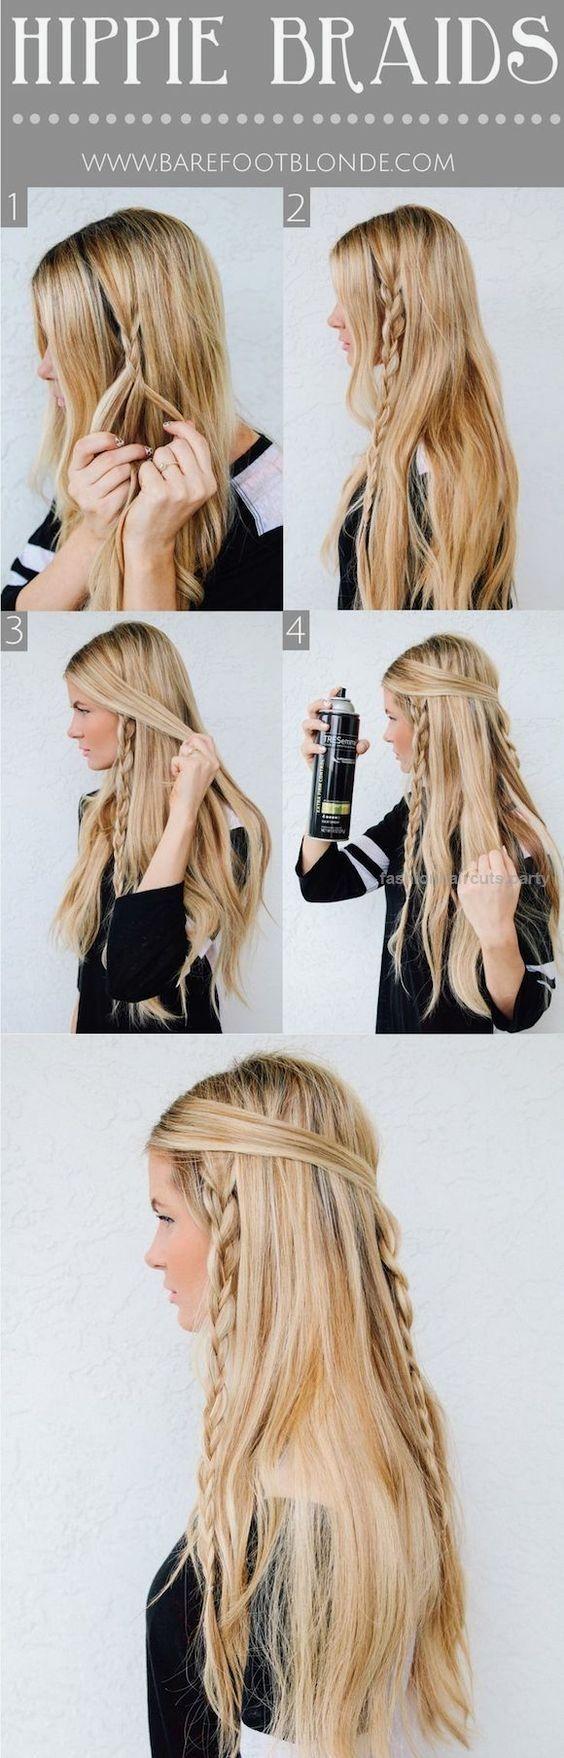 Easy Everyday Hairstyles For Medium Length Hair – StyleCraze ...